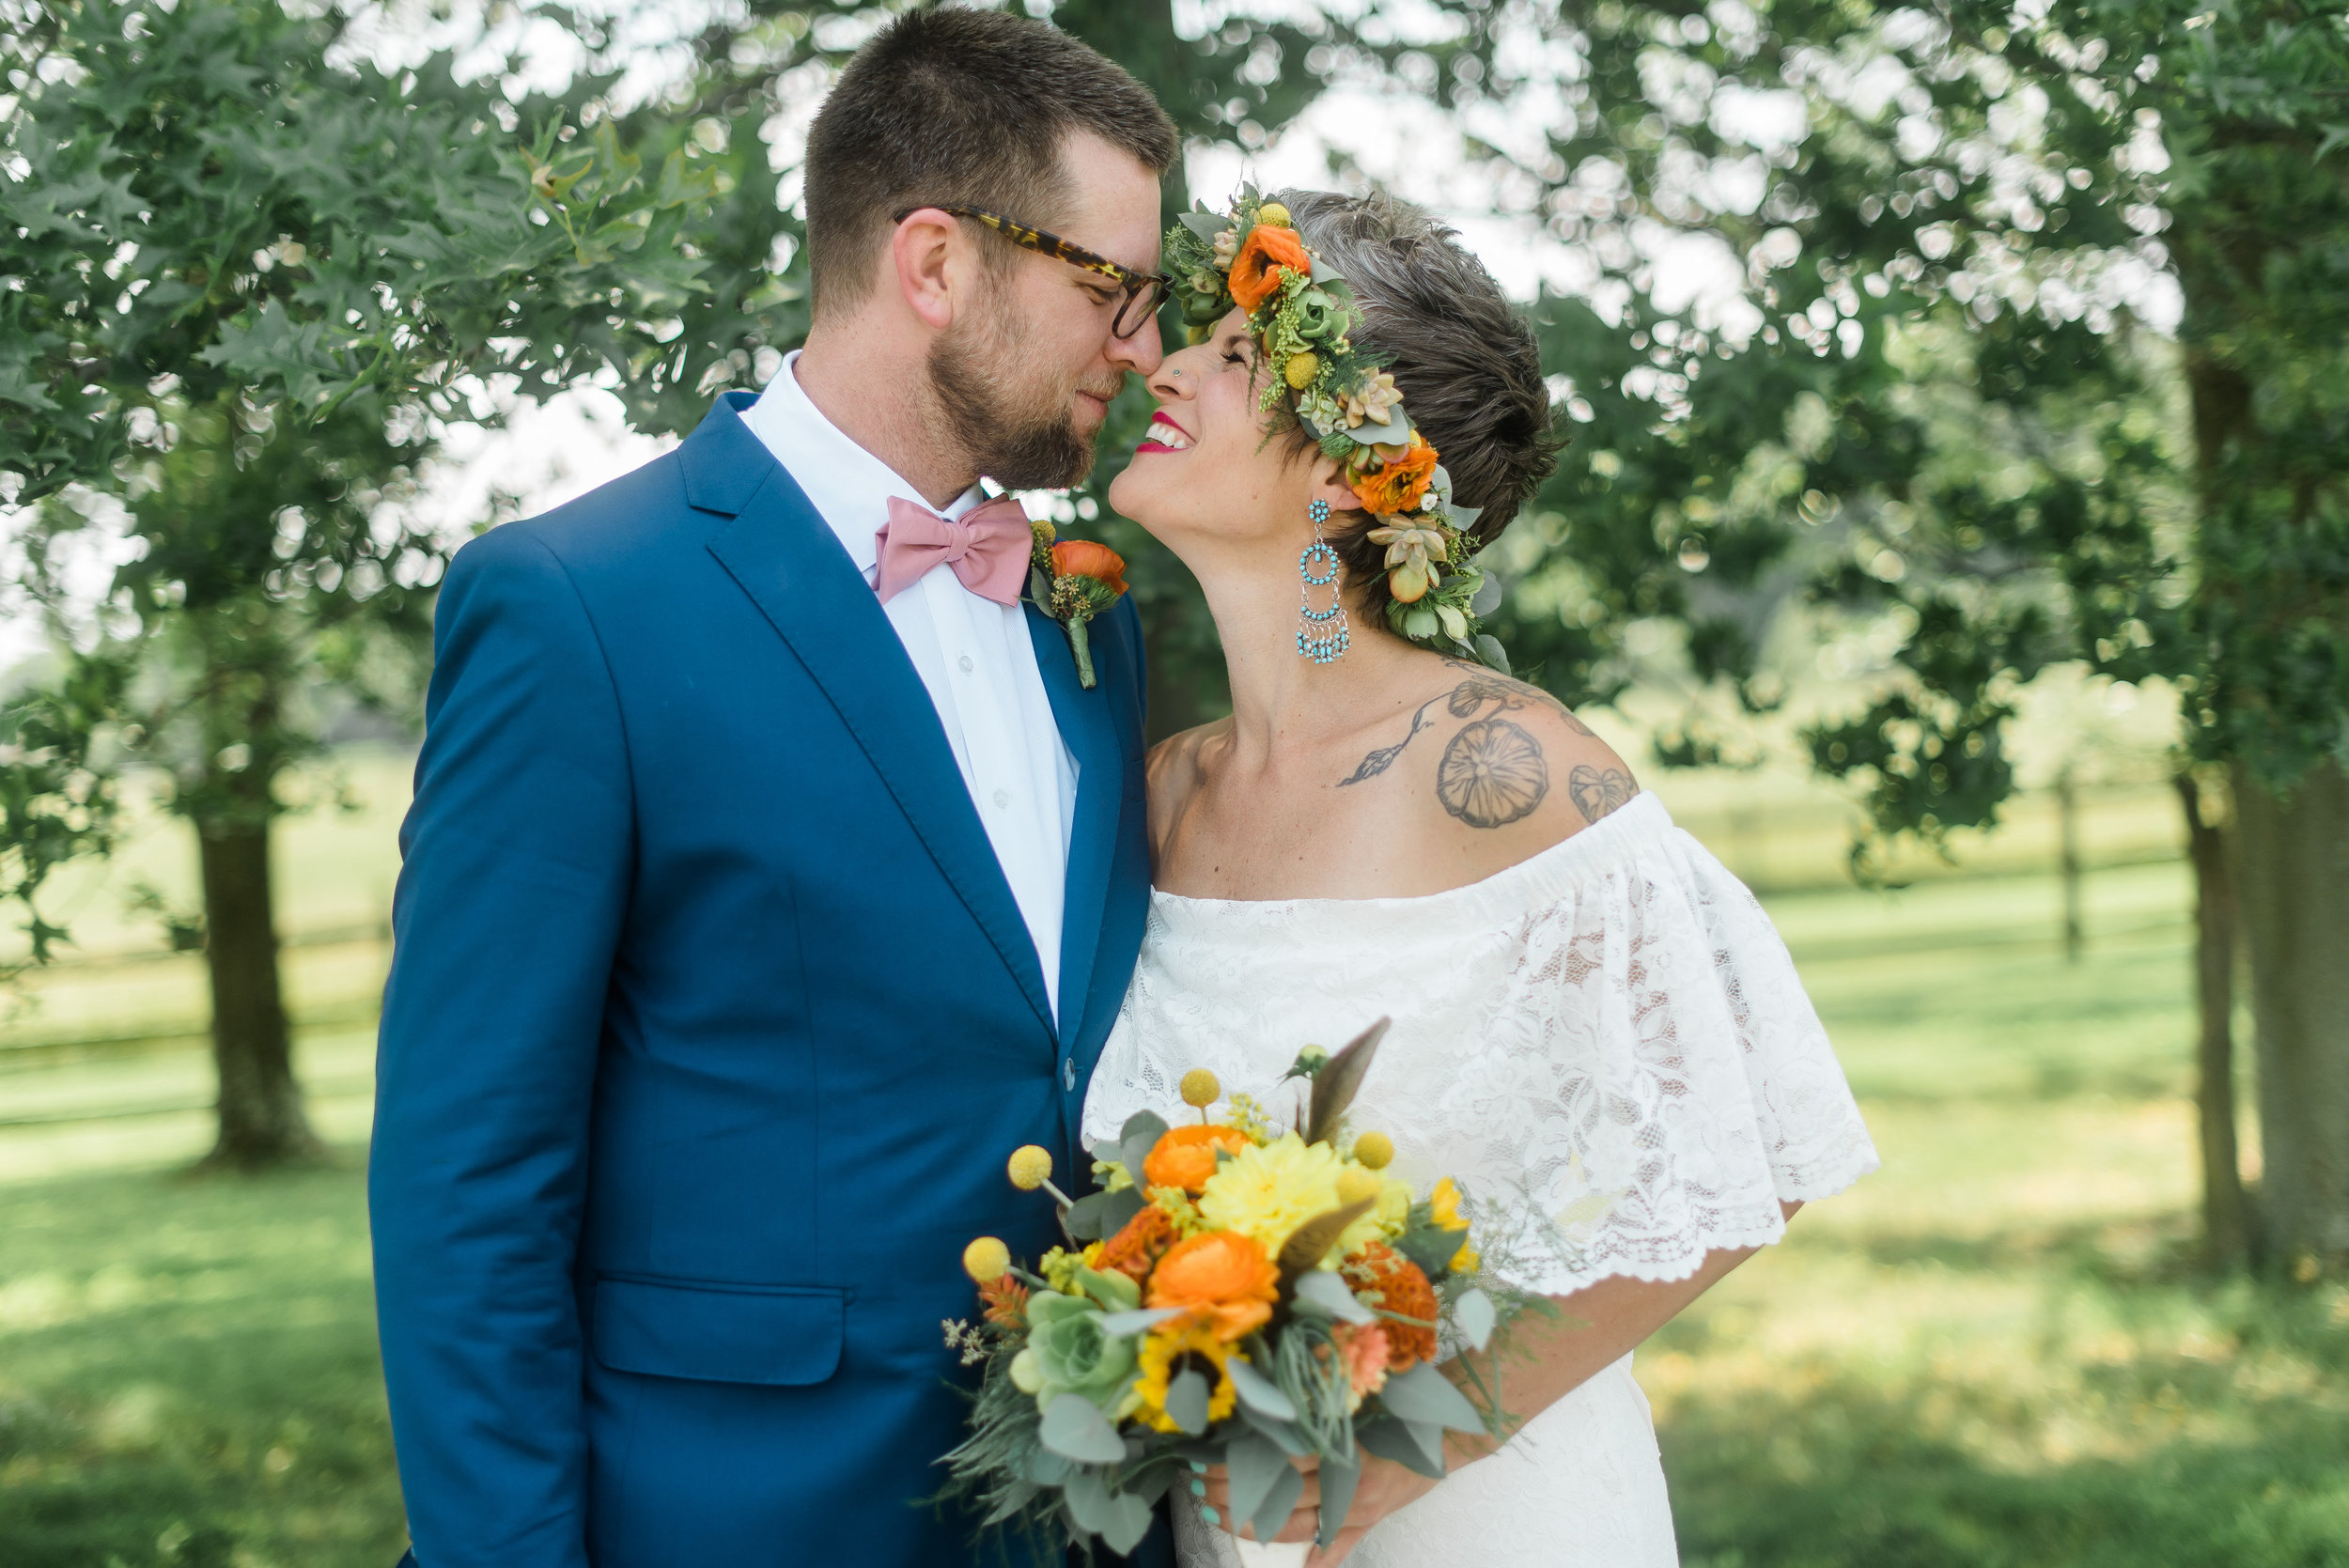 pittsburgh-wedding-photographer-armstrongfarms-eclectic-offbeat-boho0139.jpg